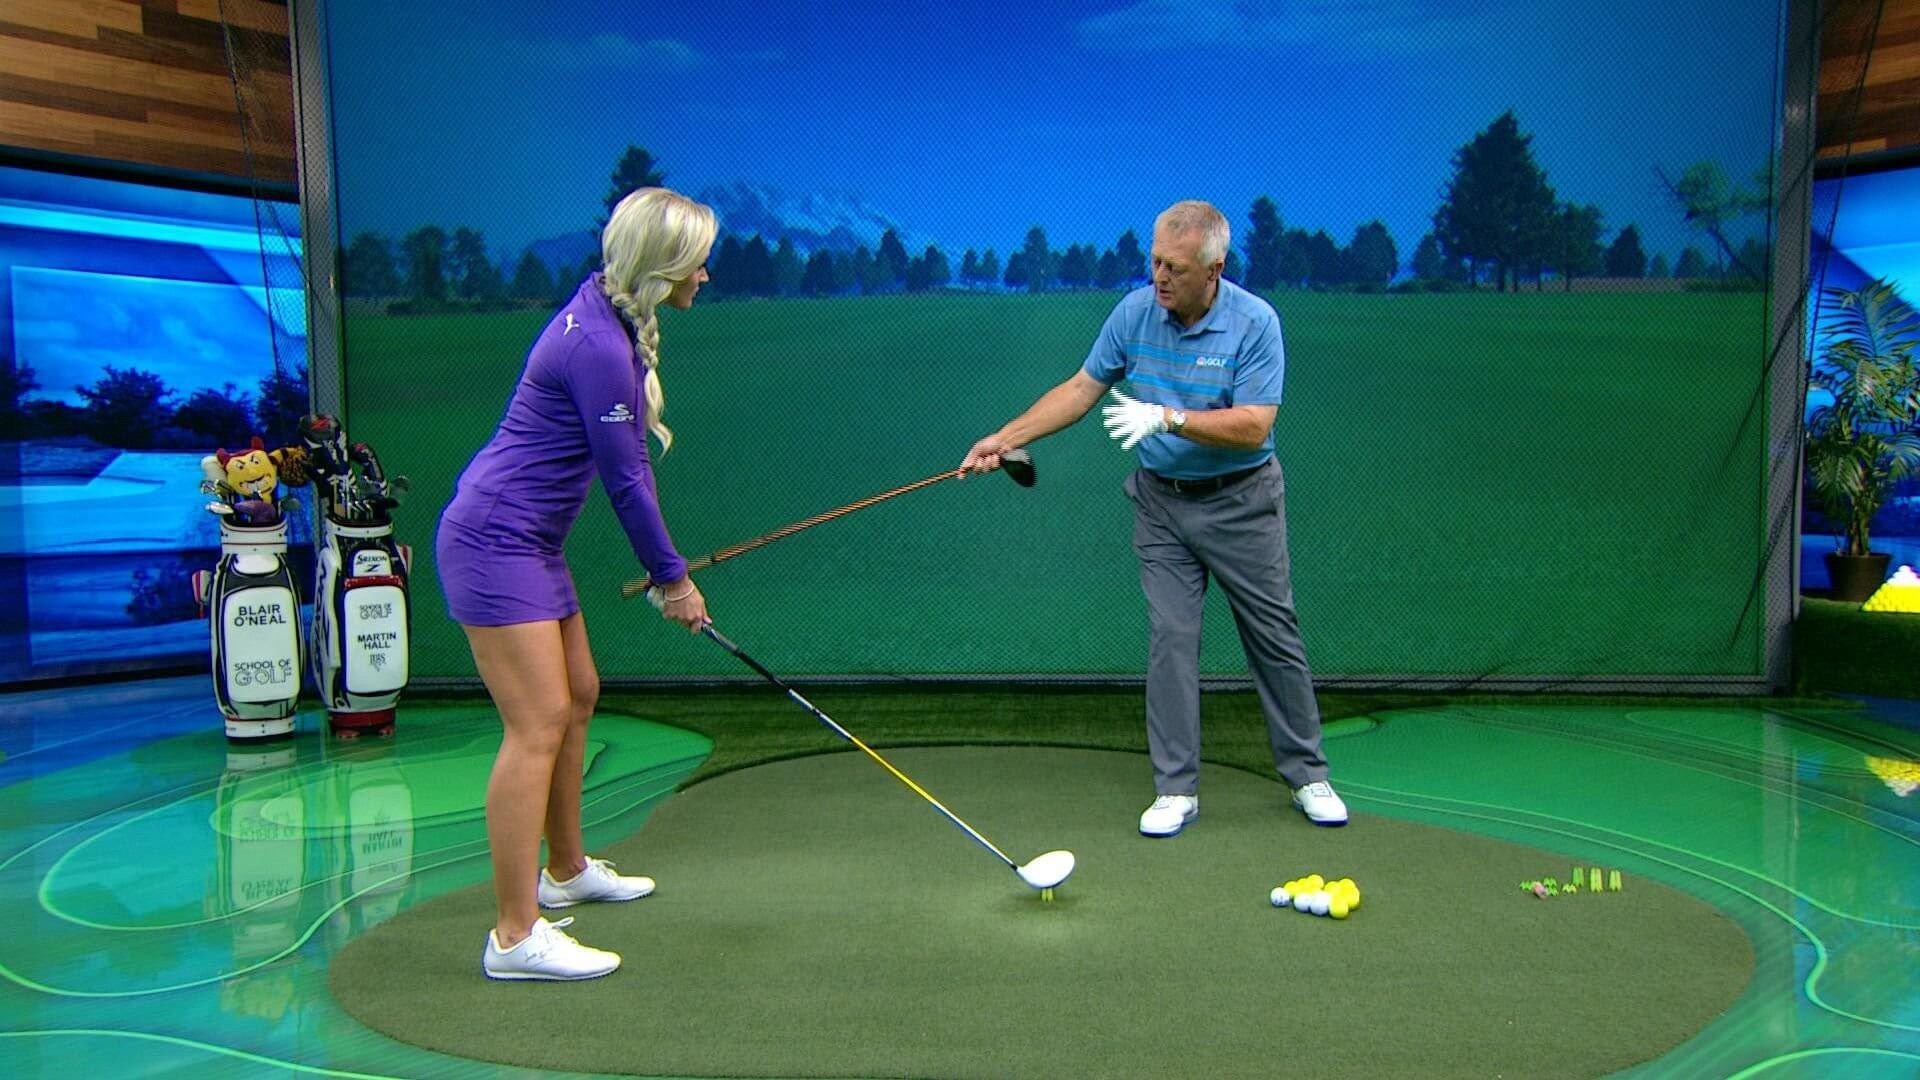 Golfinstruktioner